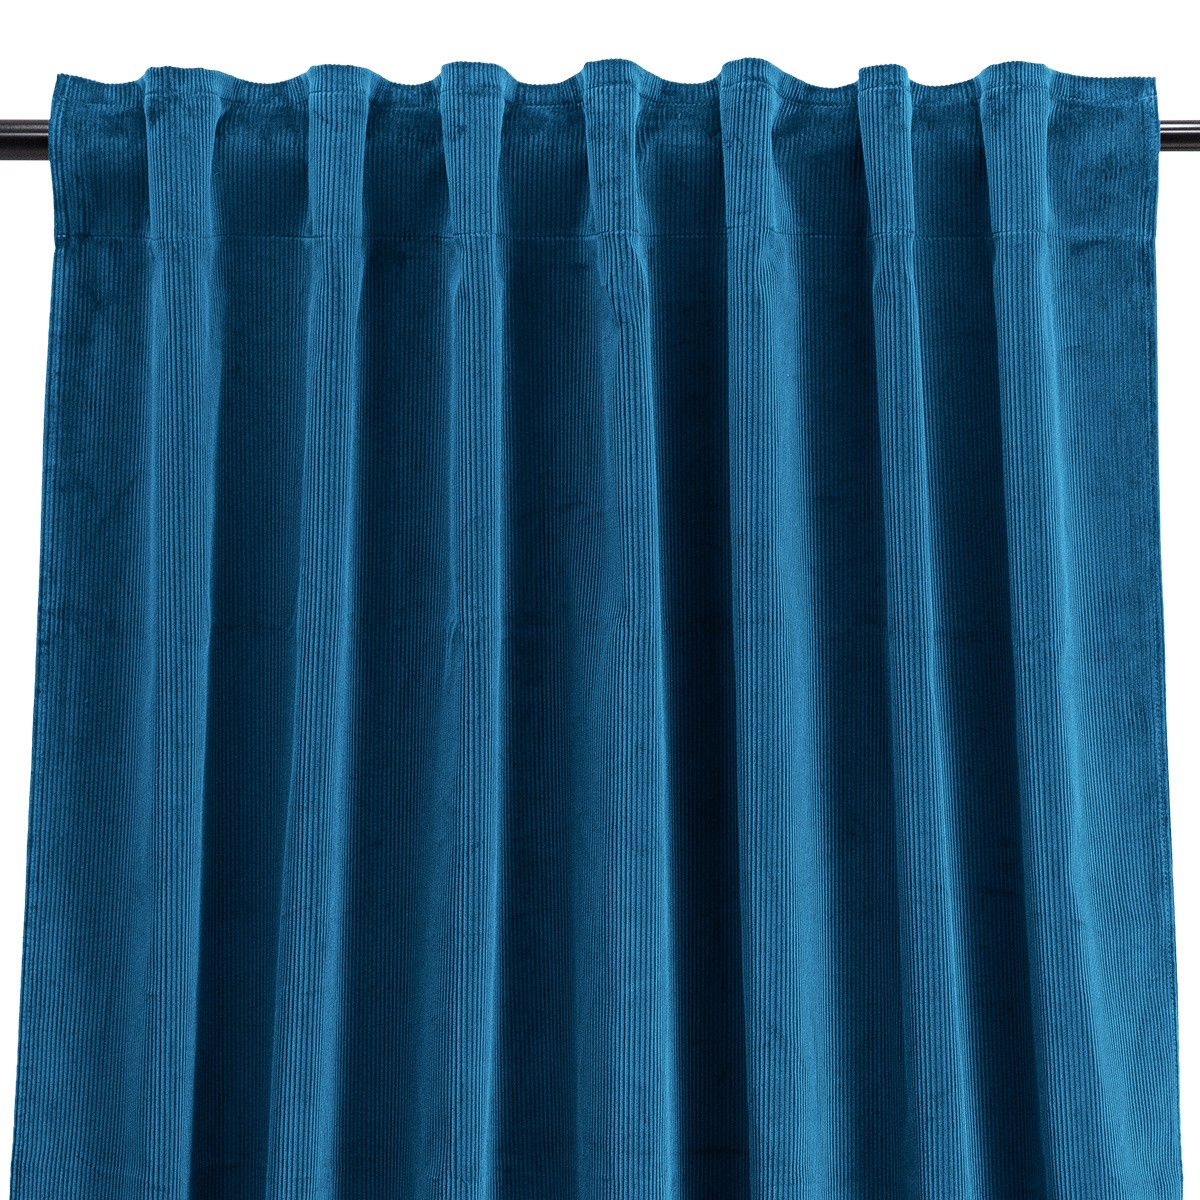 Palazzo Curtain, Blue